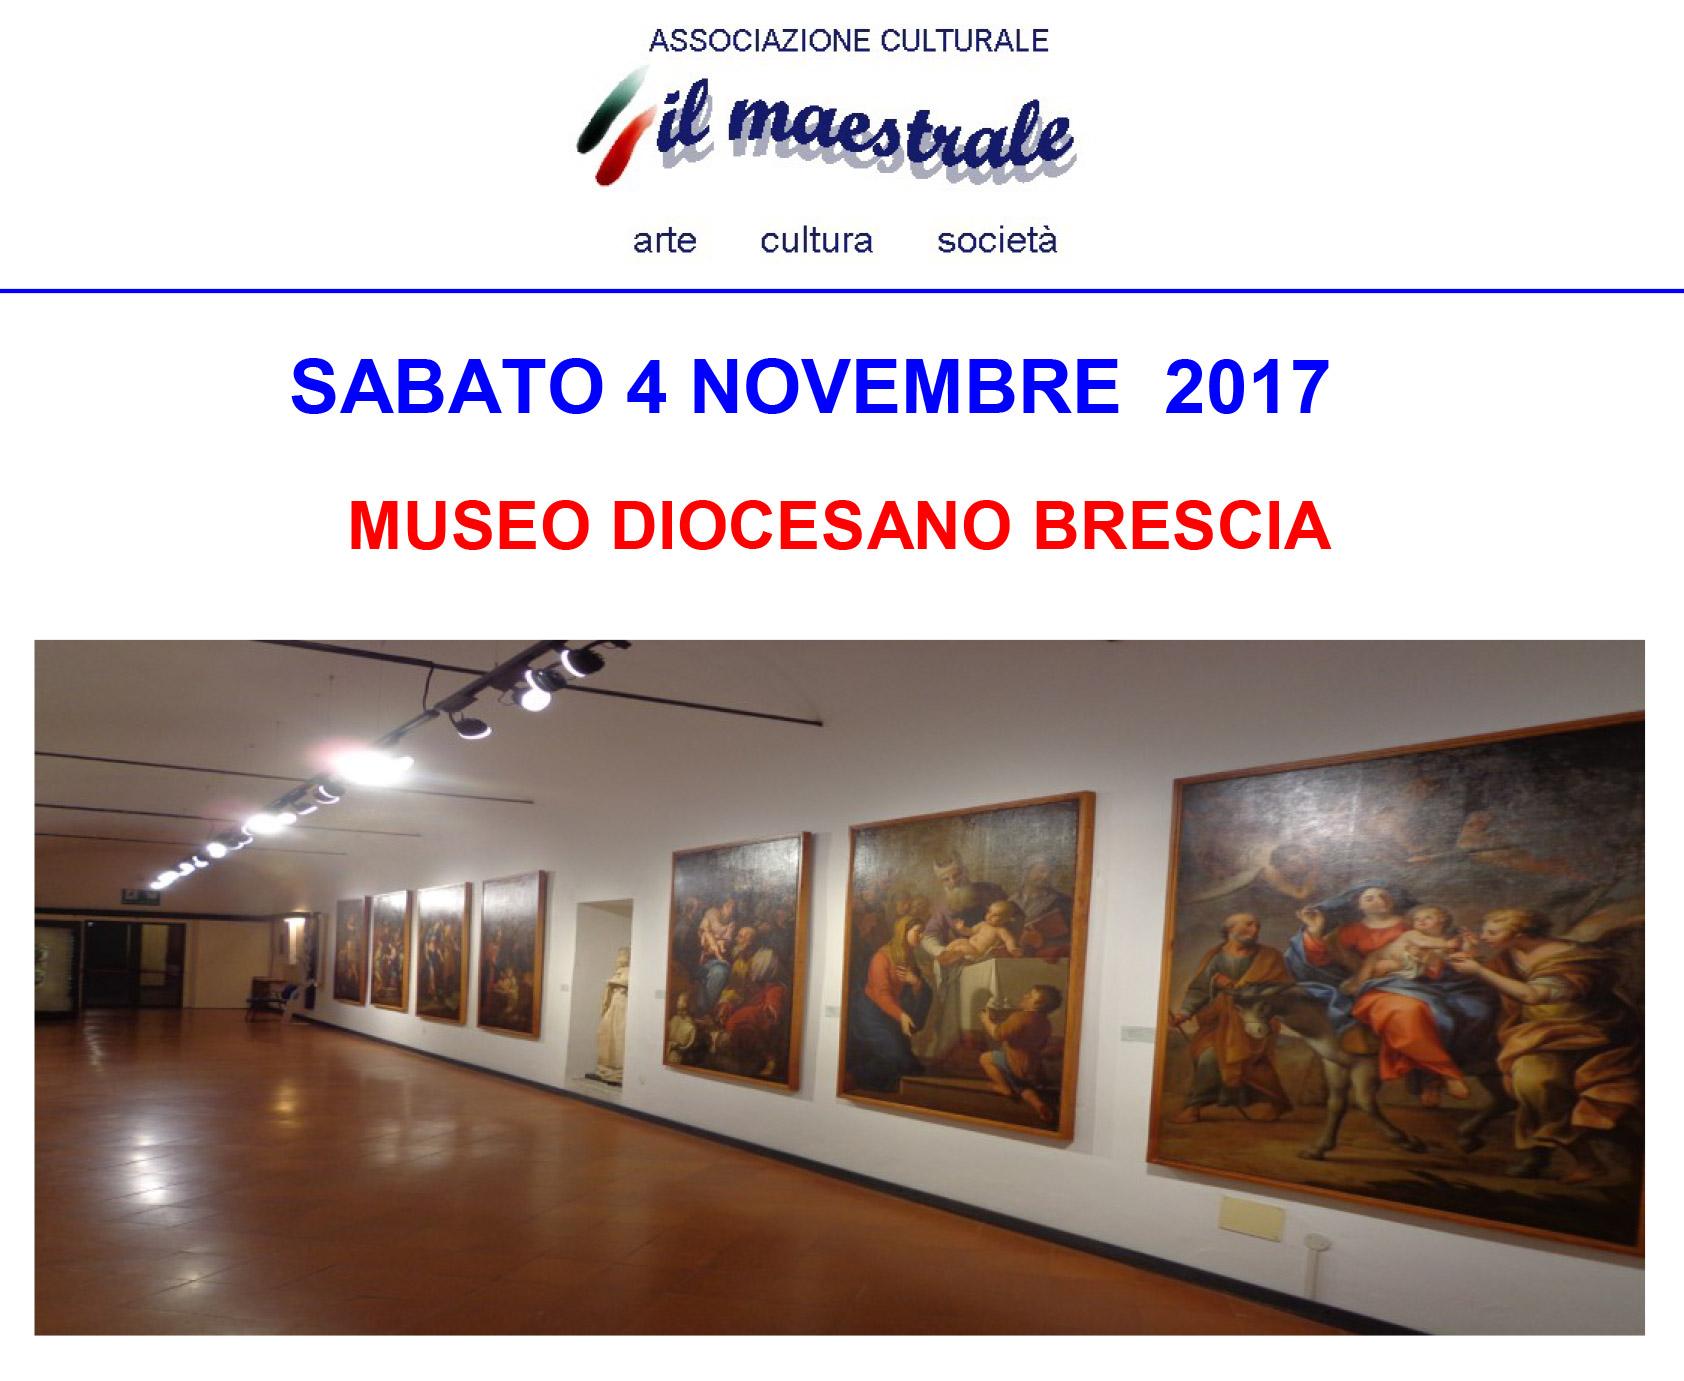 Visita al MUSEO DIOCESANO BRESCIA